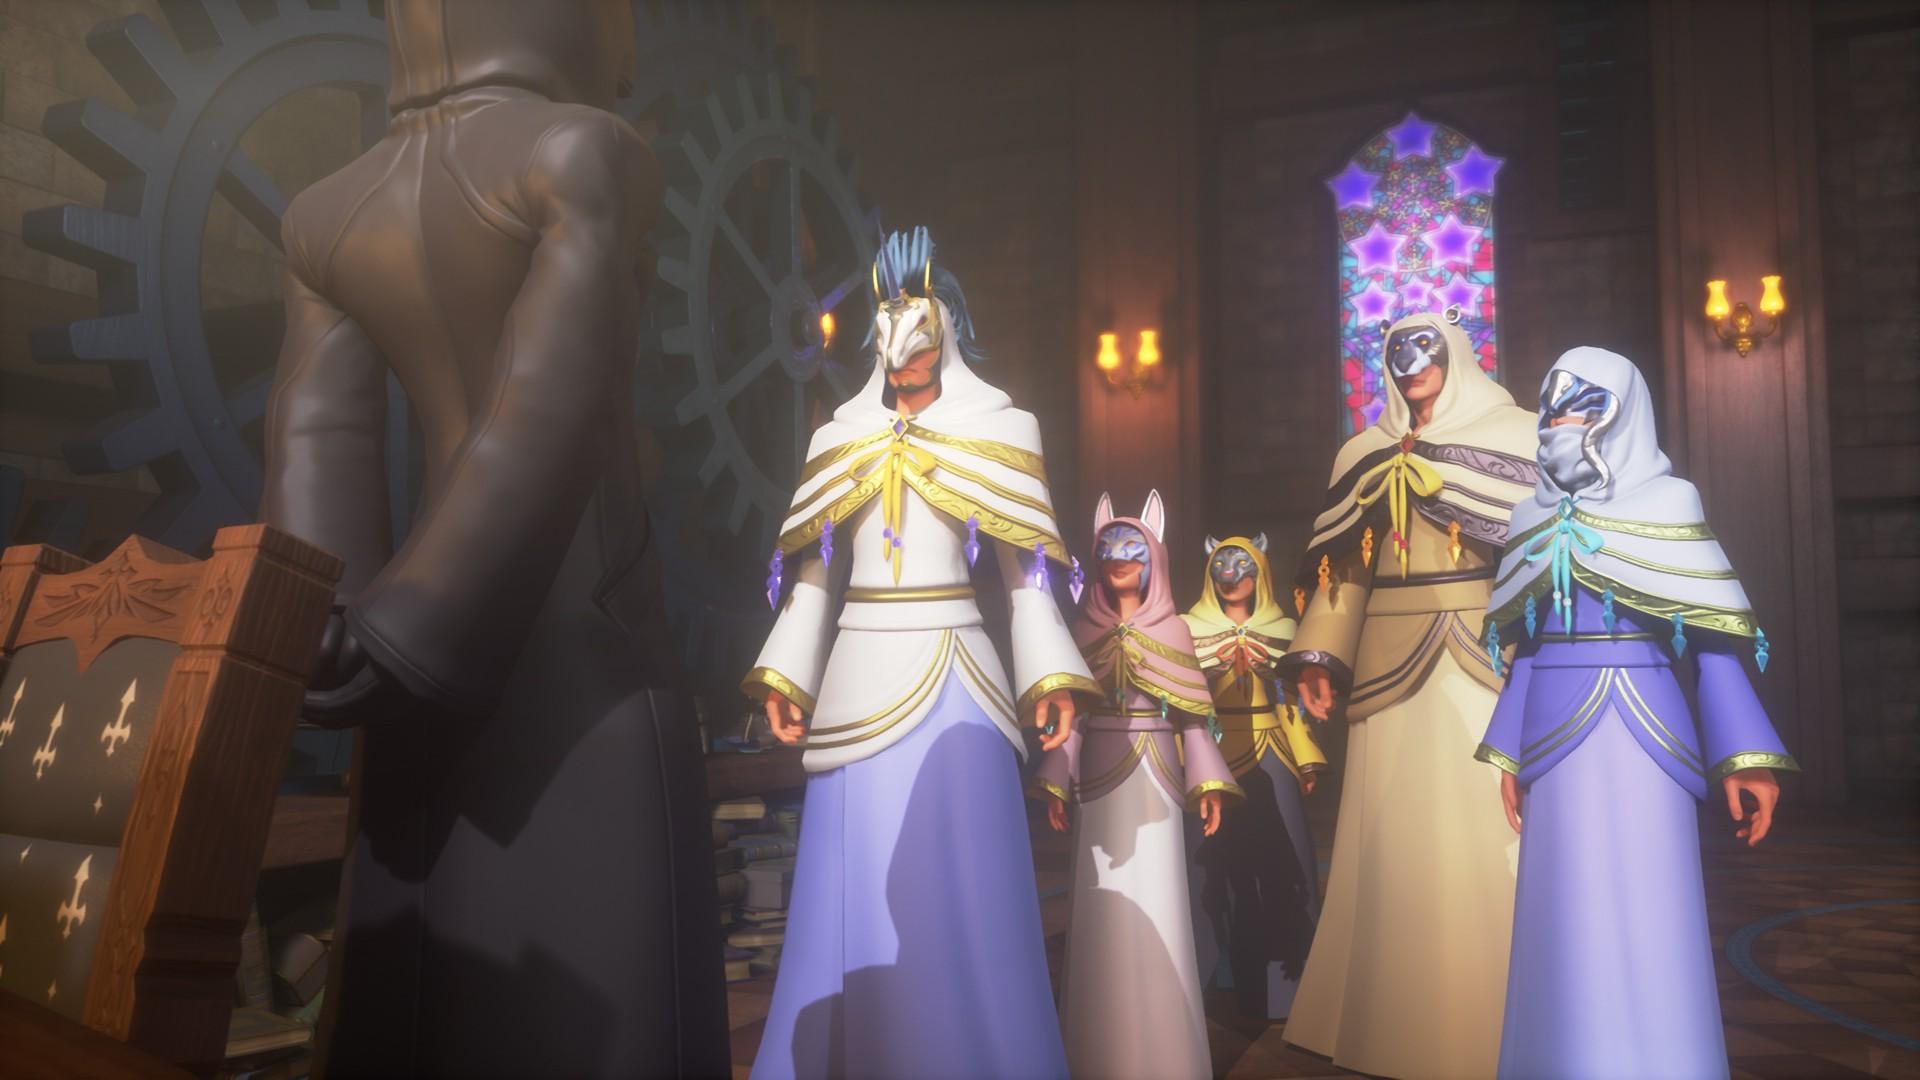 KINGDOM HEARTS HD 2.8 Final Chapter Prologue_body_3